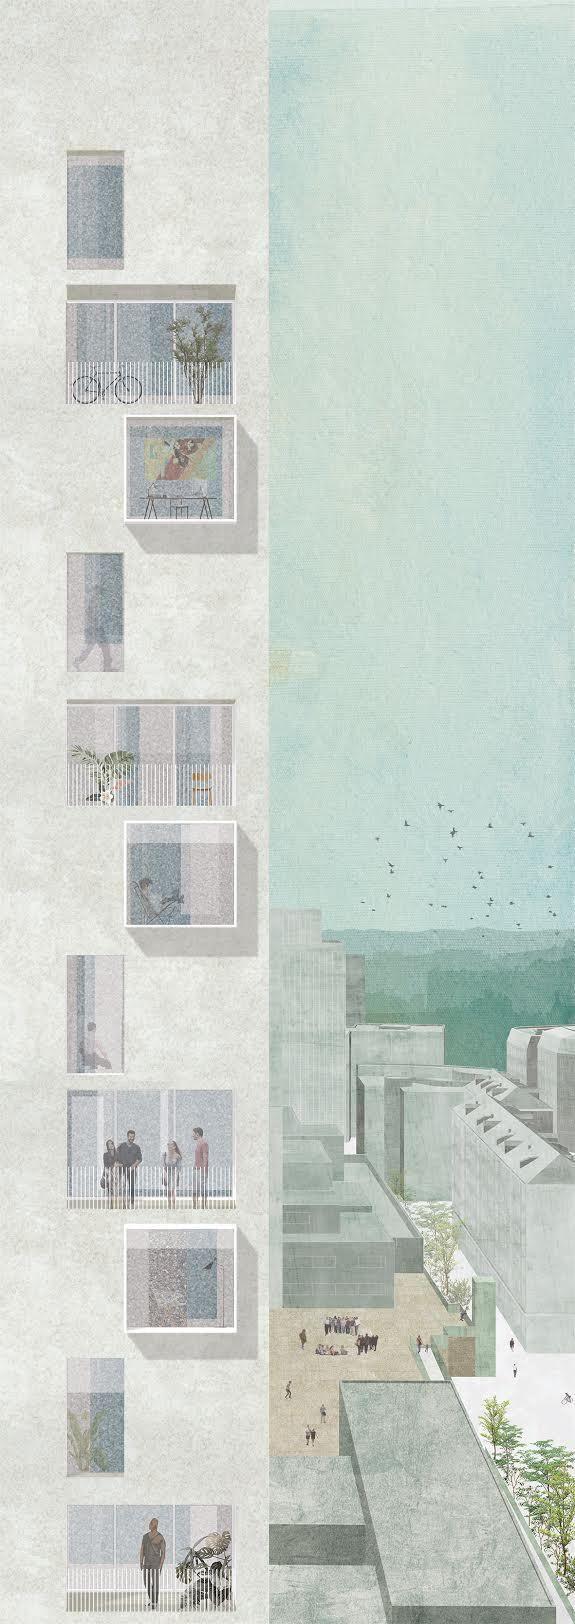 Metamorphosis of a Monument - Florent Leung & Maxime Duquet